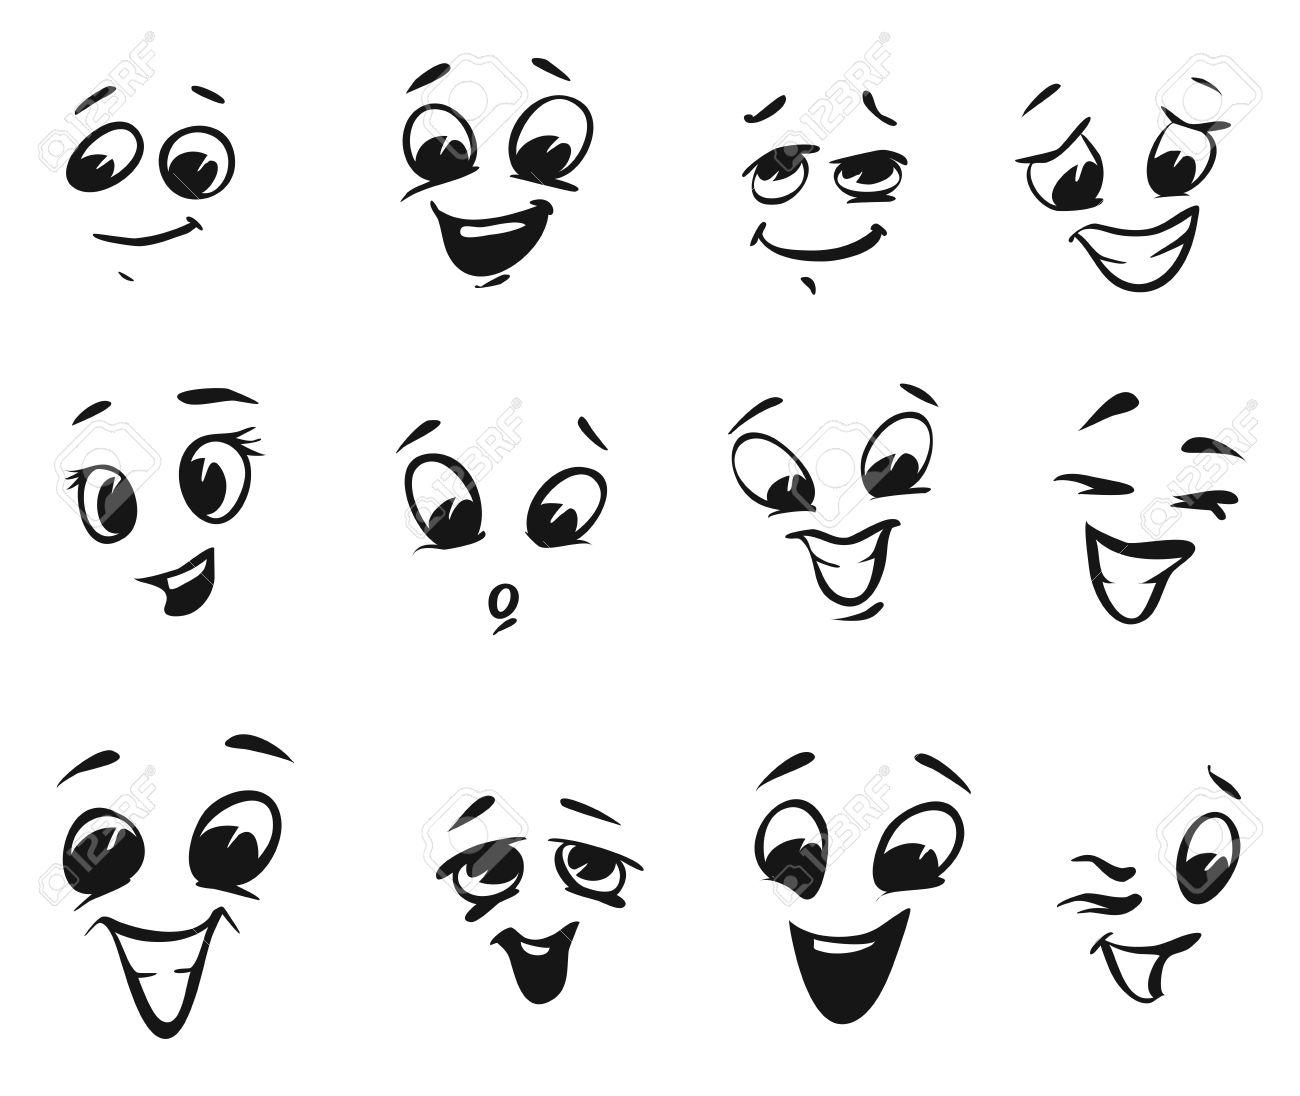 happy smiling and laughing cartoon faces tiny illustrations rh 123rf com happy faces cartoon pics happy cartoon faces clip art